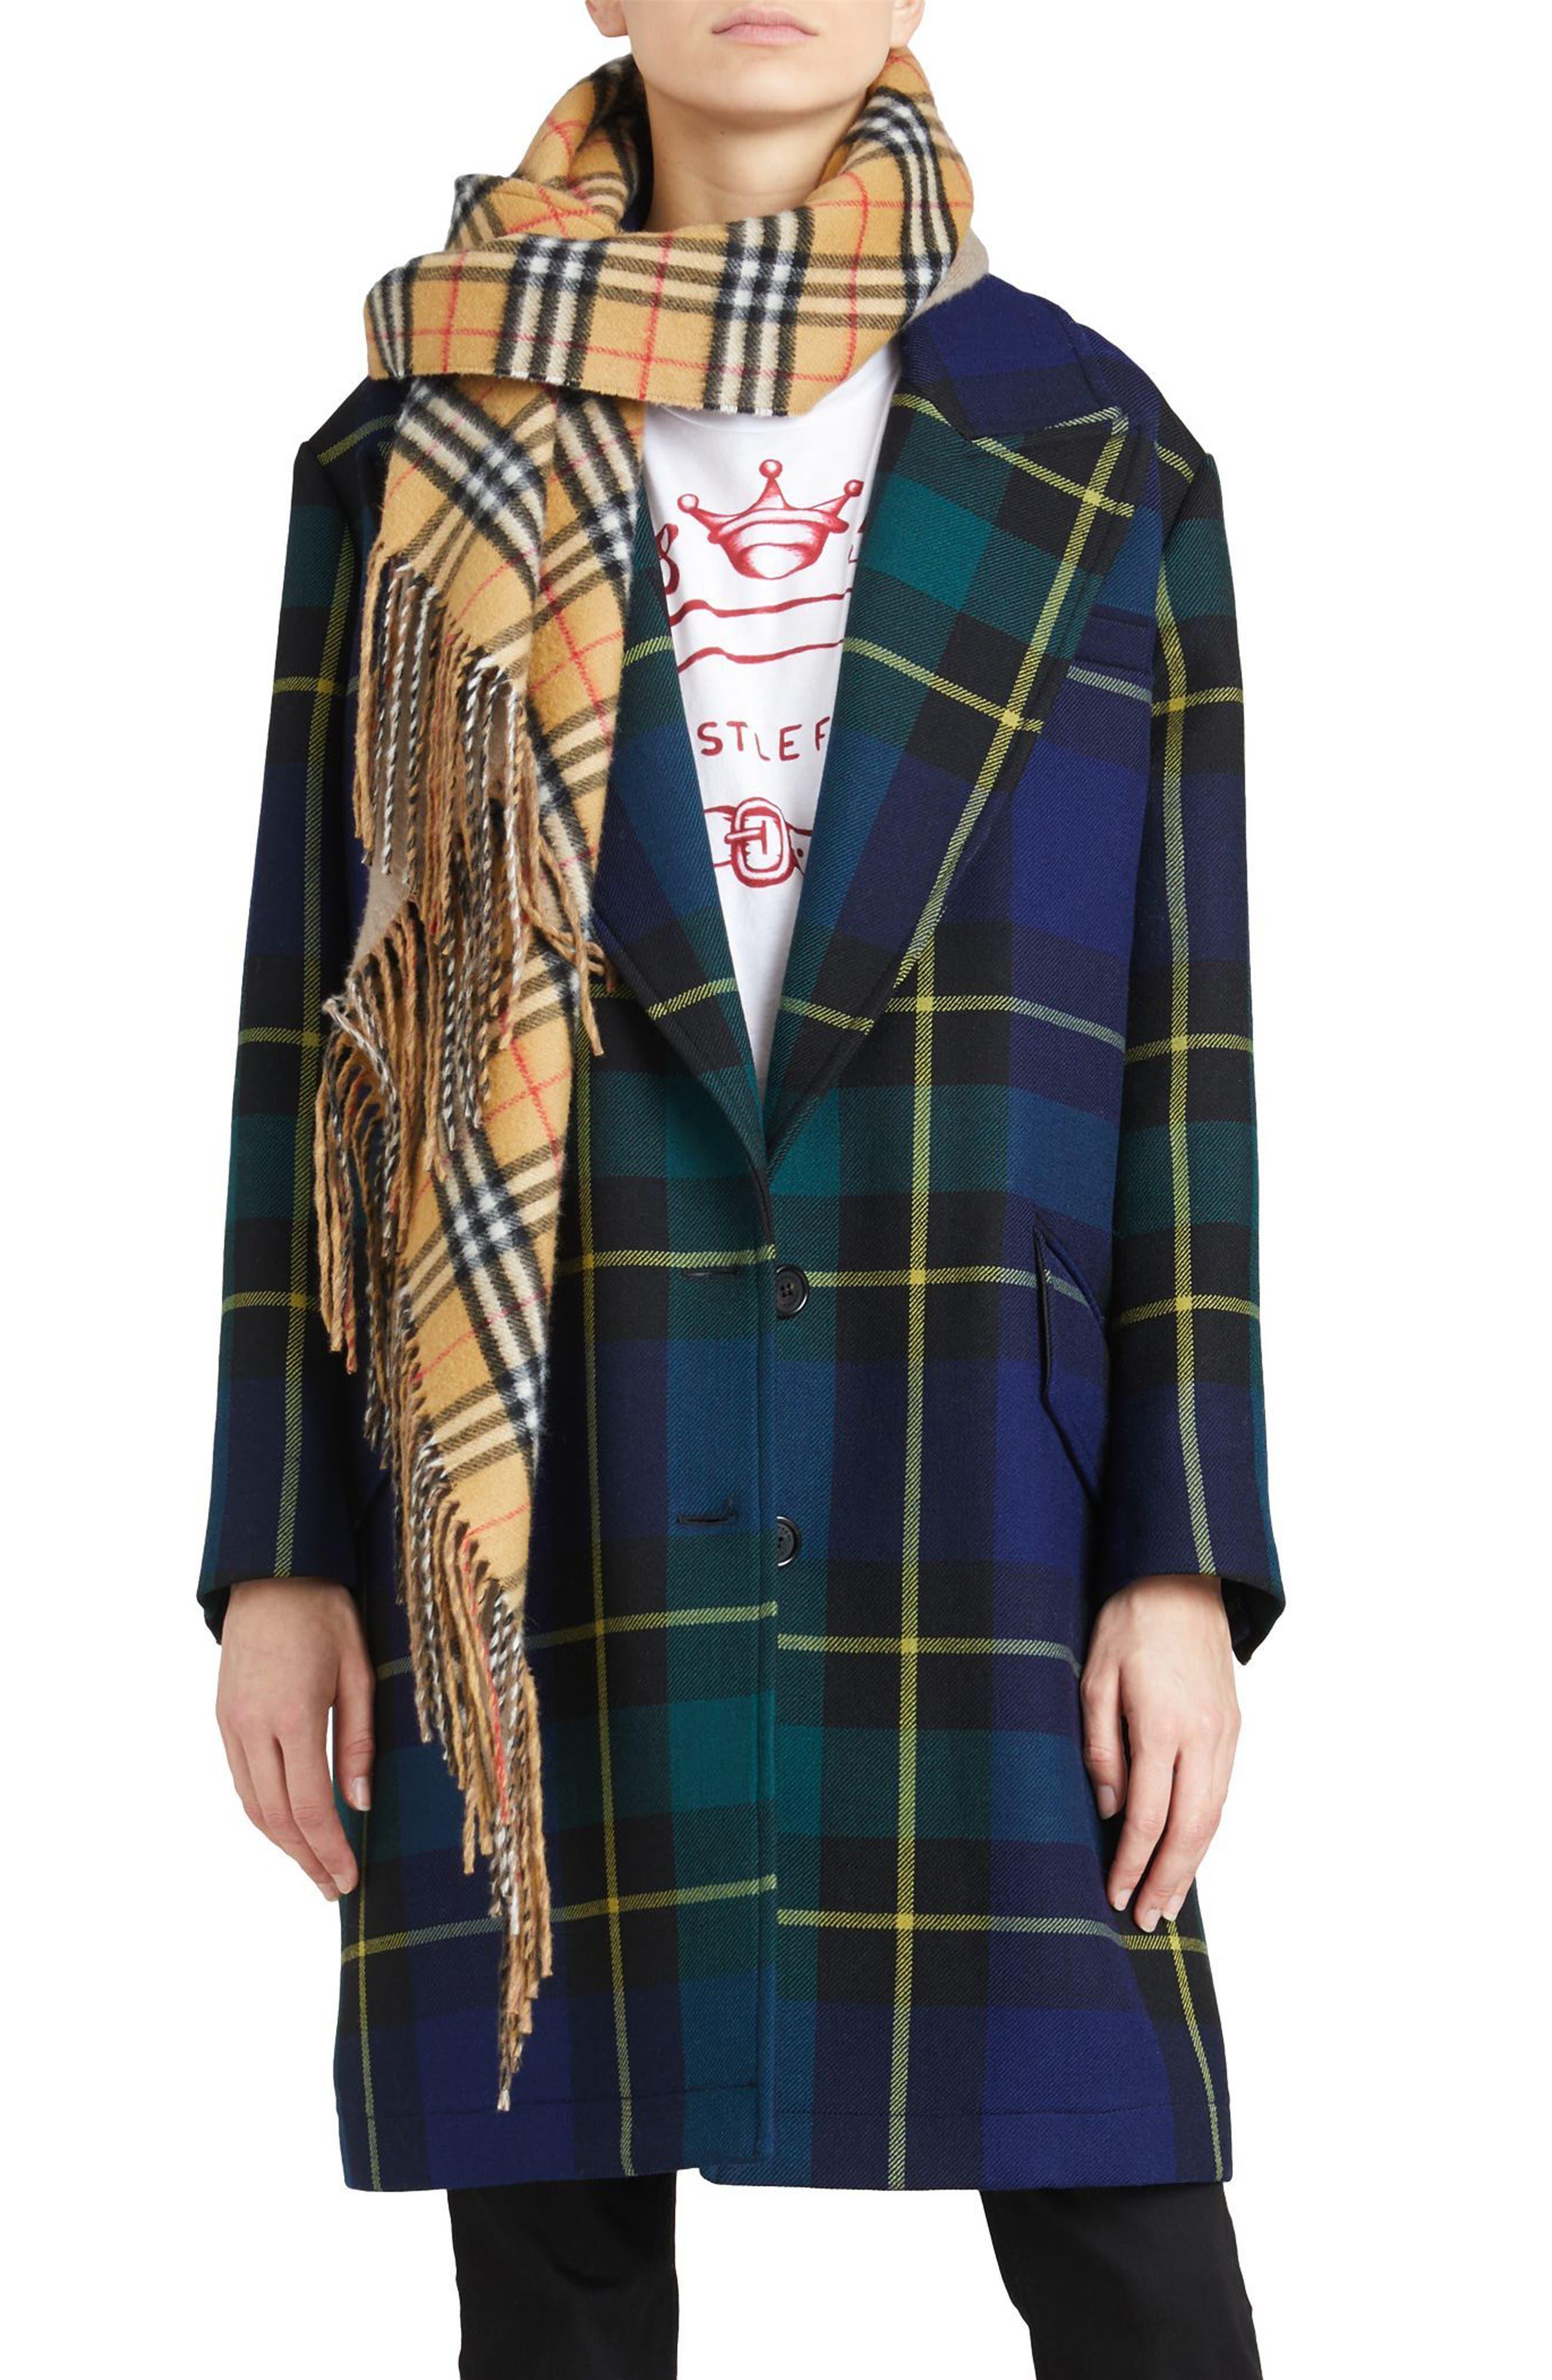 Main Image - Burberry Strathyre Tartan Plaid Wool Blend Coat